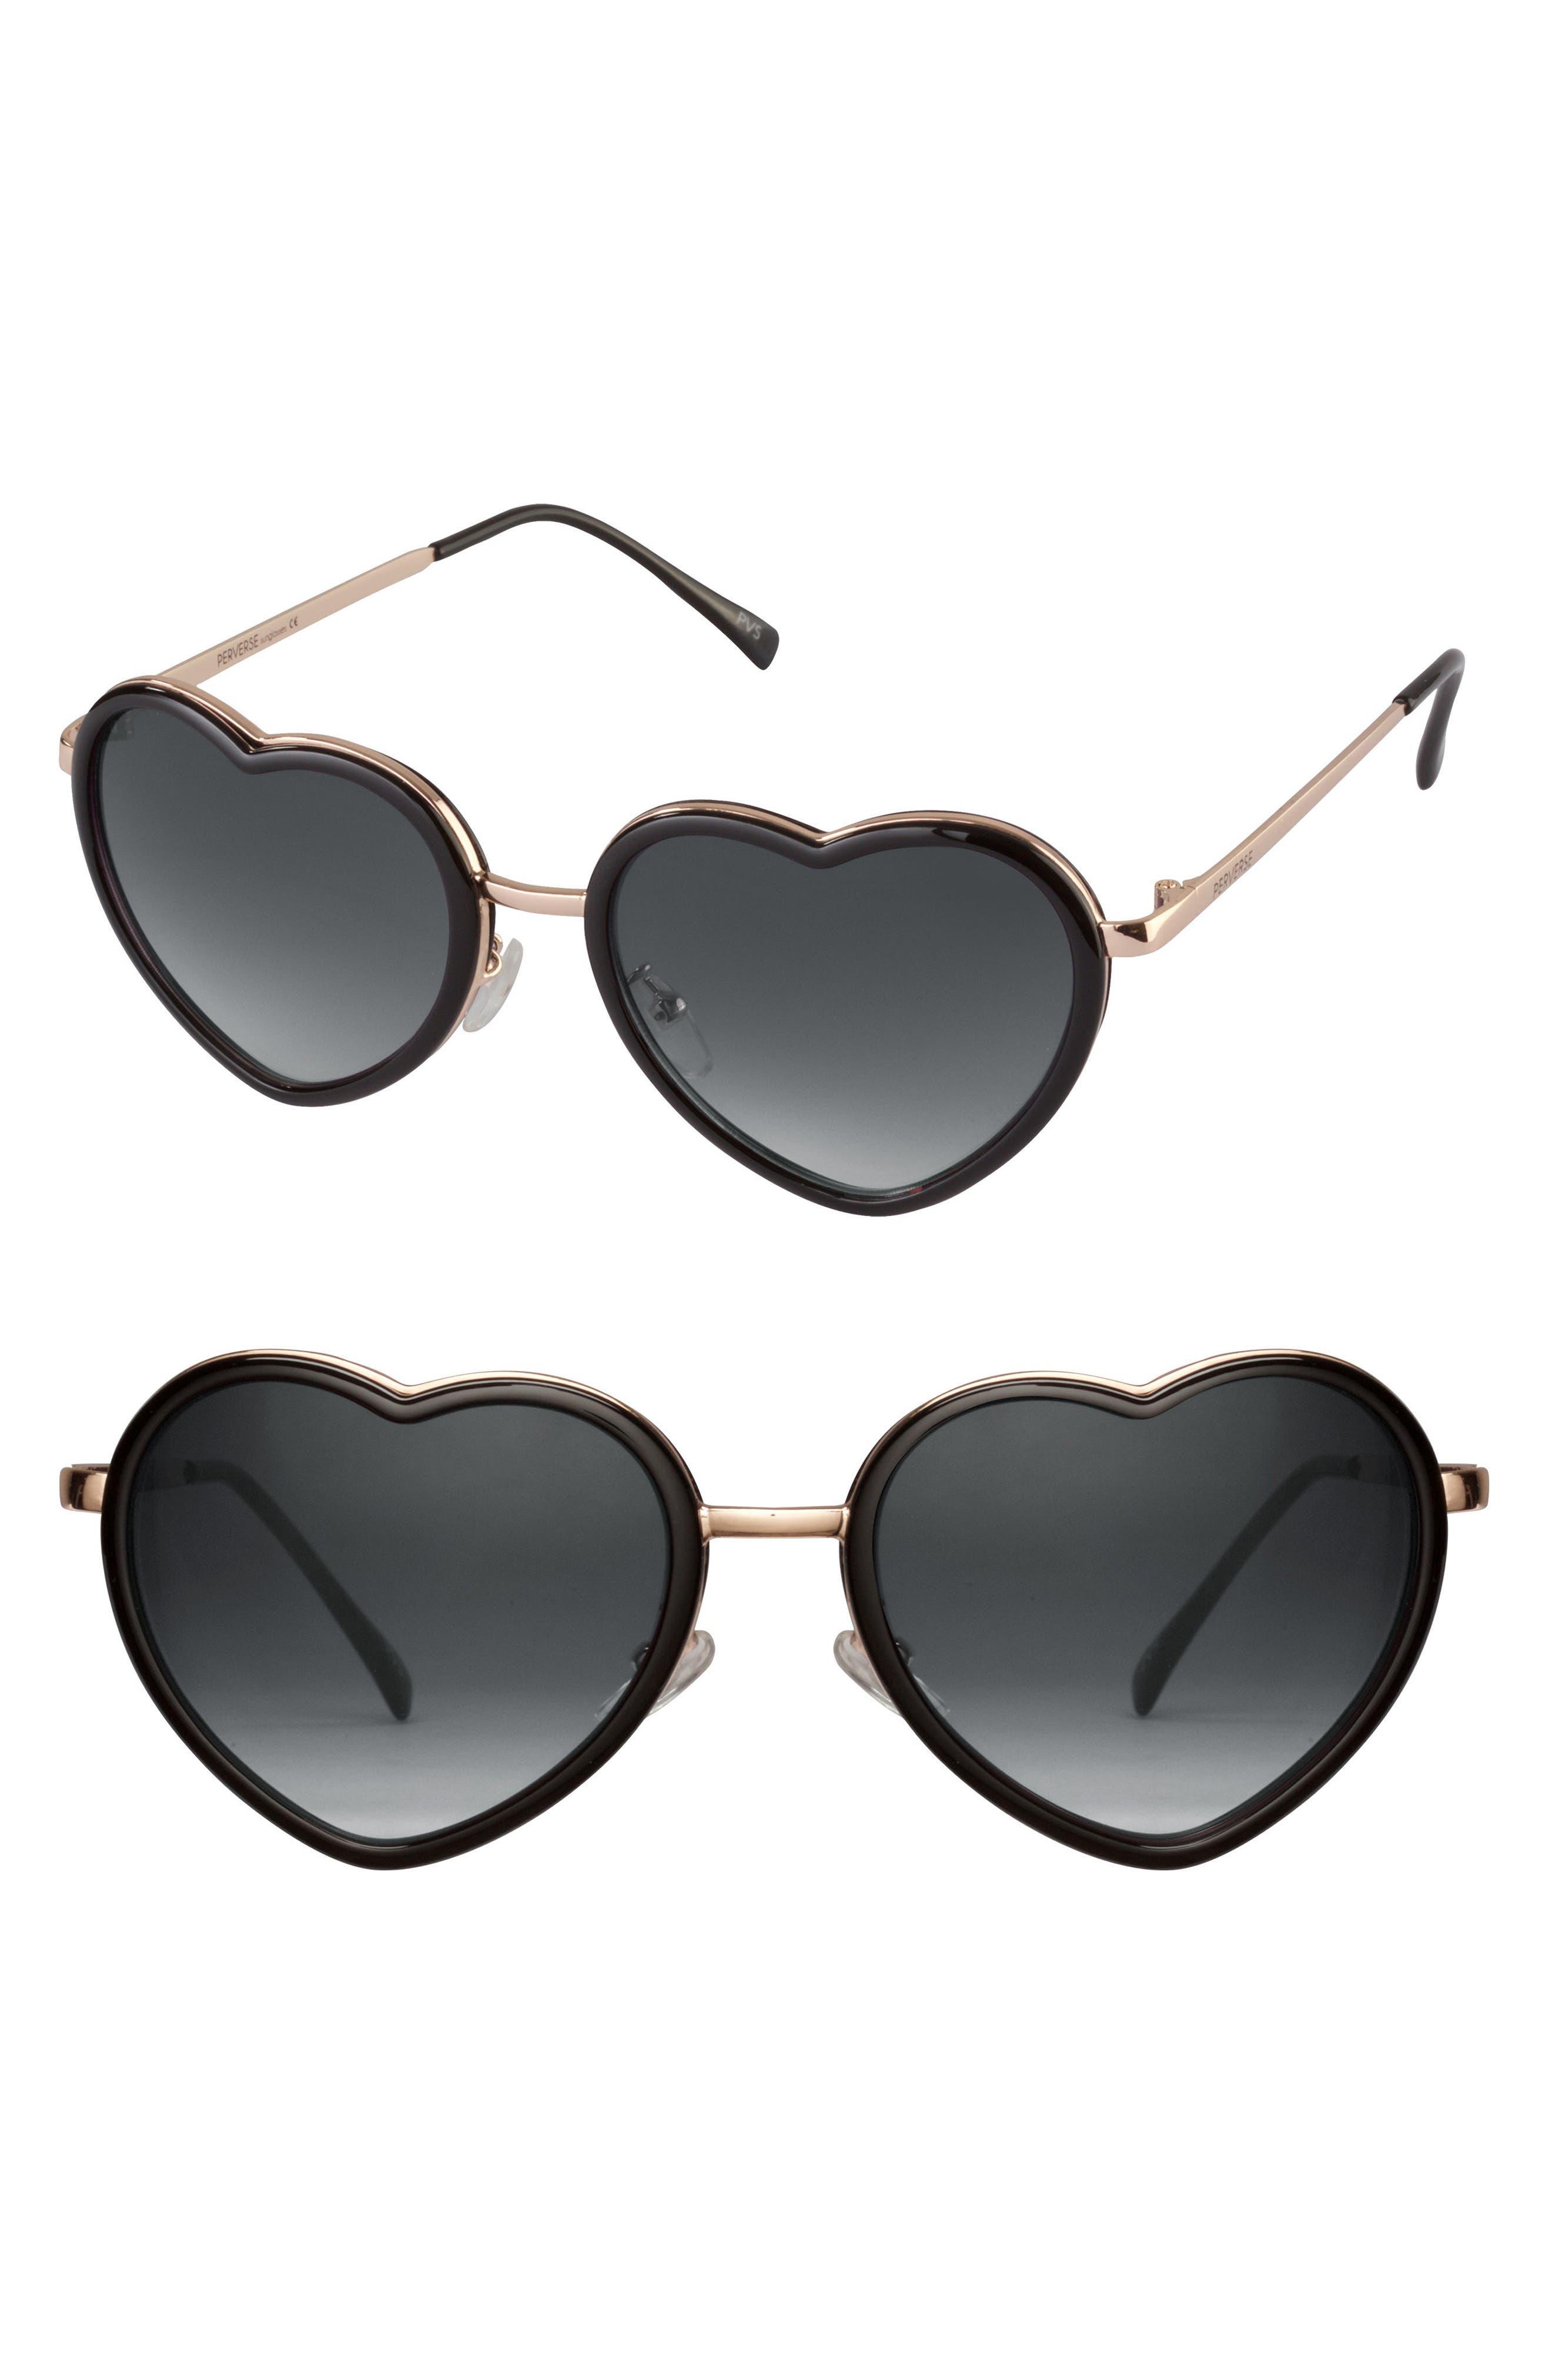 Poipu 52mm Heart Sunglasses,                             Main thumbnail 1, color,